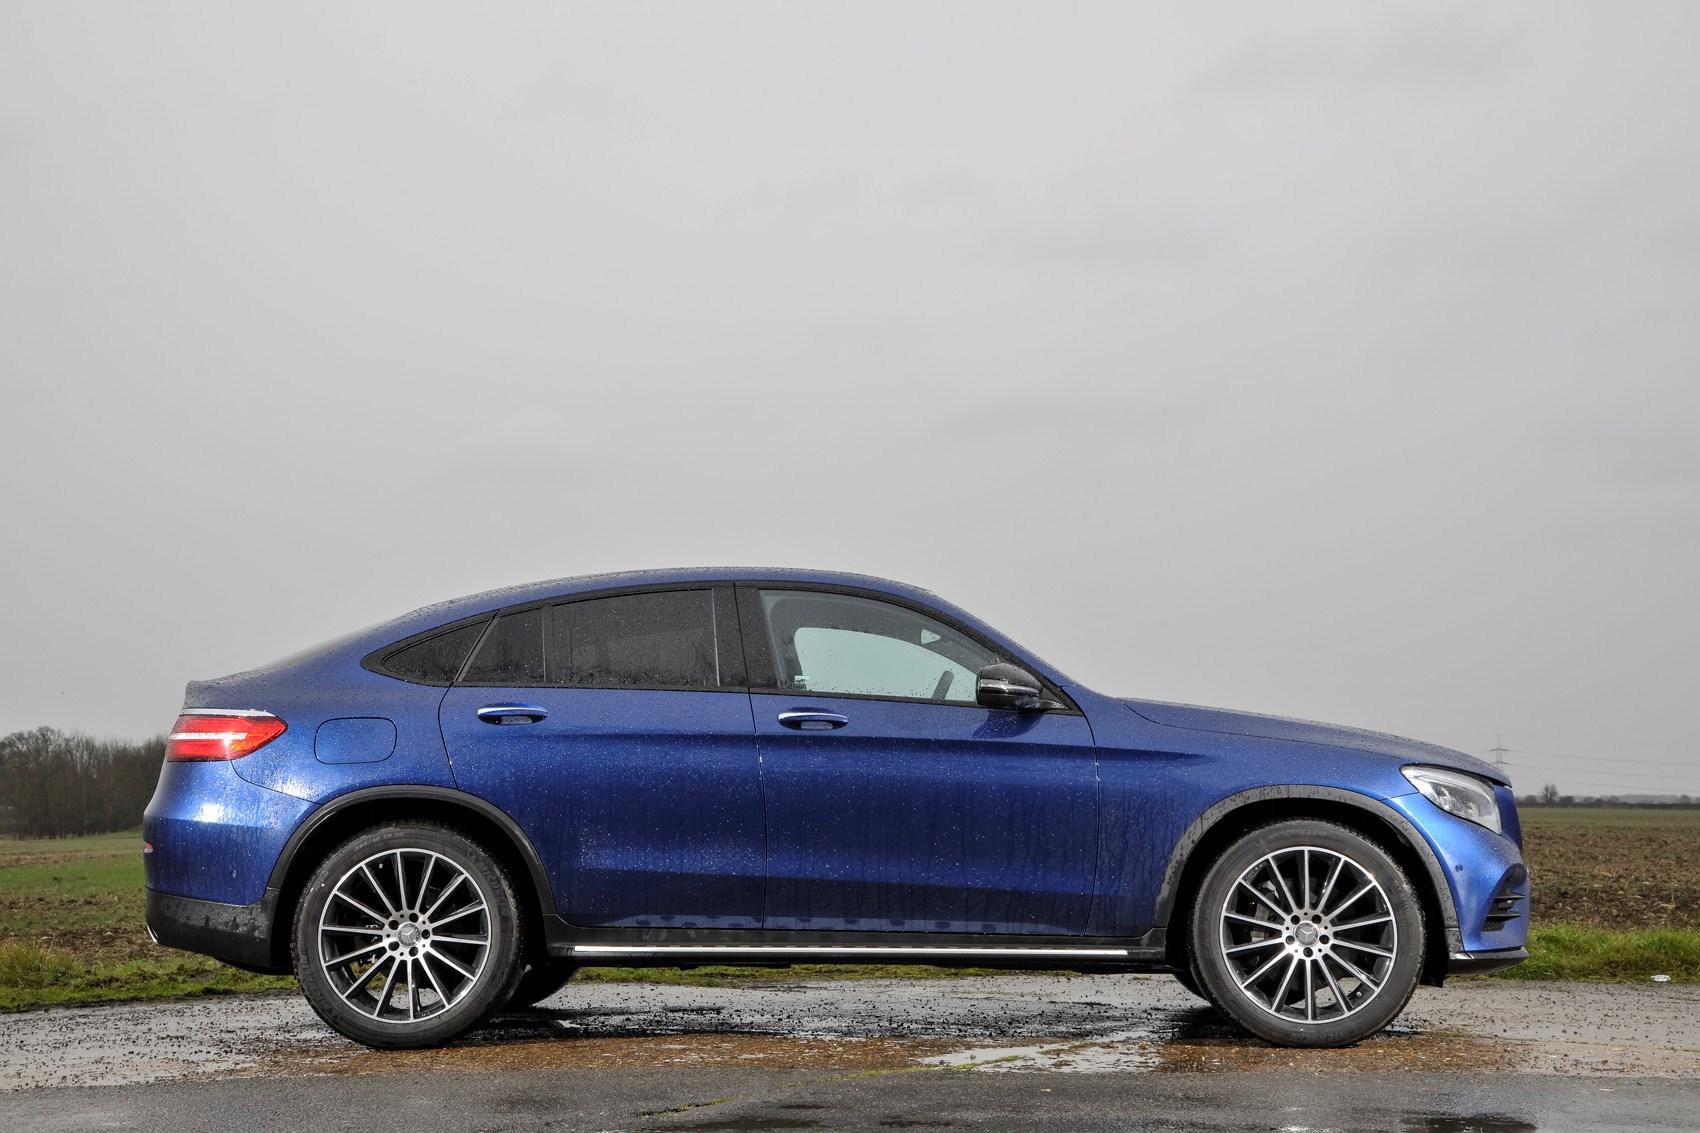 Blue 2018 Mercedes-Benz GLC Coupe side elevation